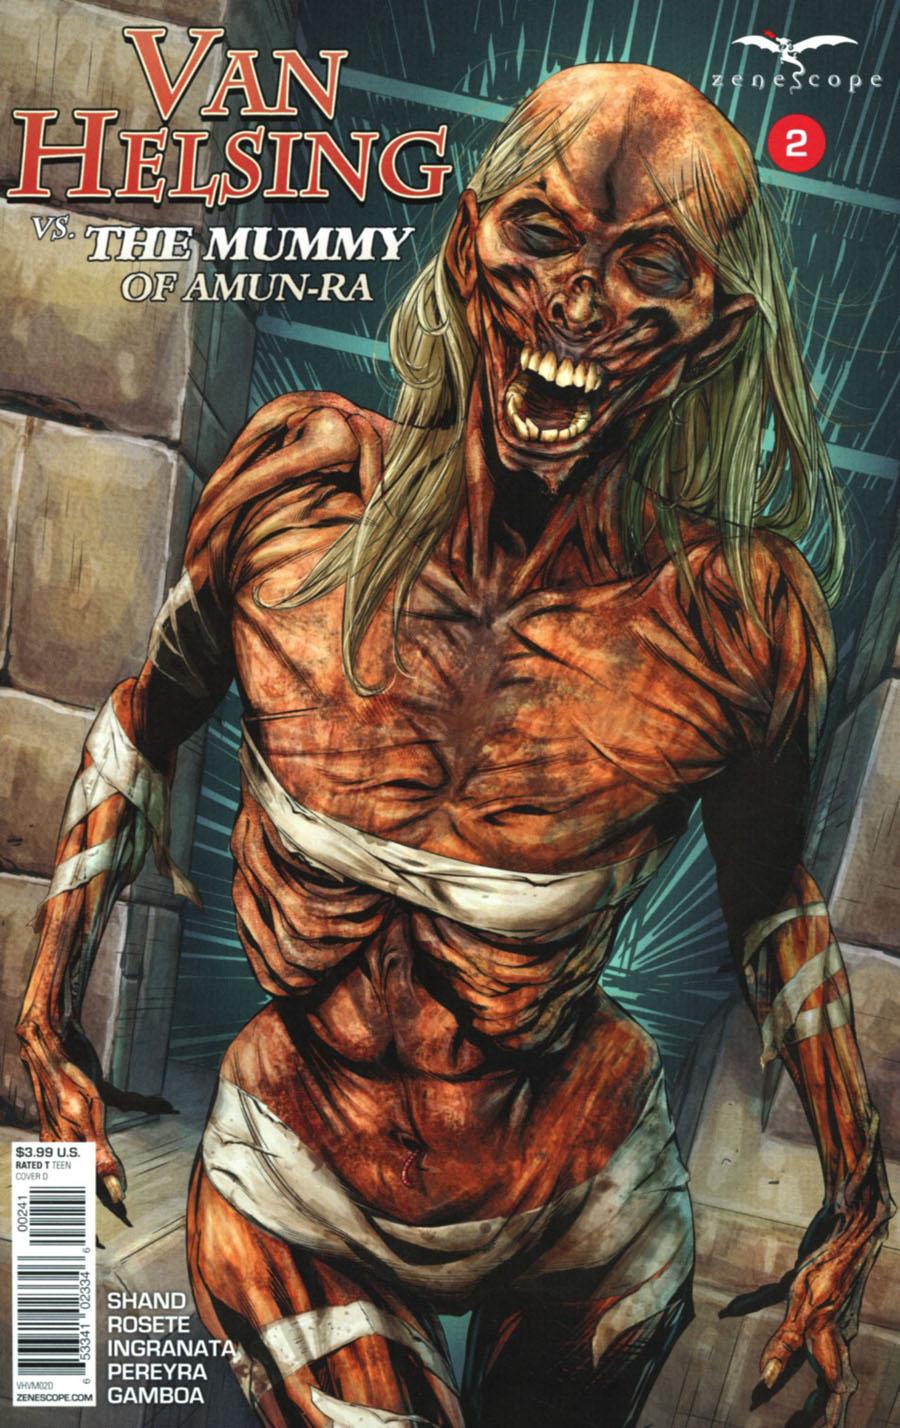 Grimm Fairy Tales Presents Van Helsing vs The Mummy Of Amun-Ra #2 Cover D Antonio Bifulco